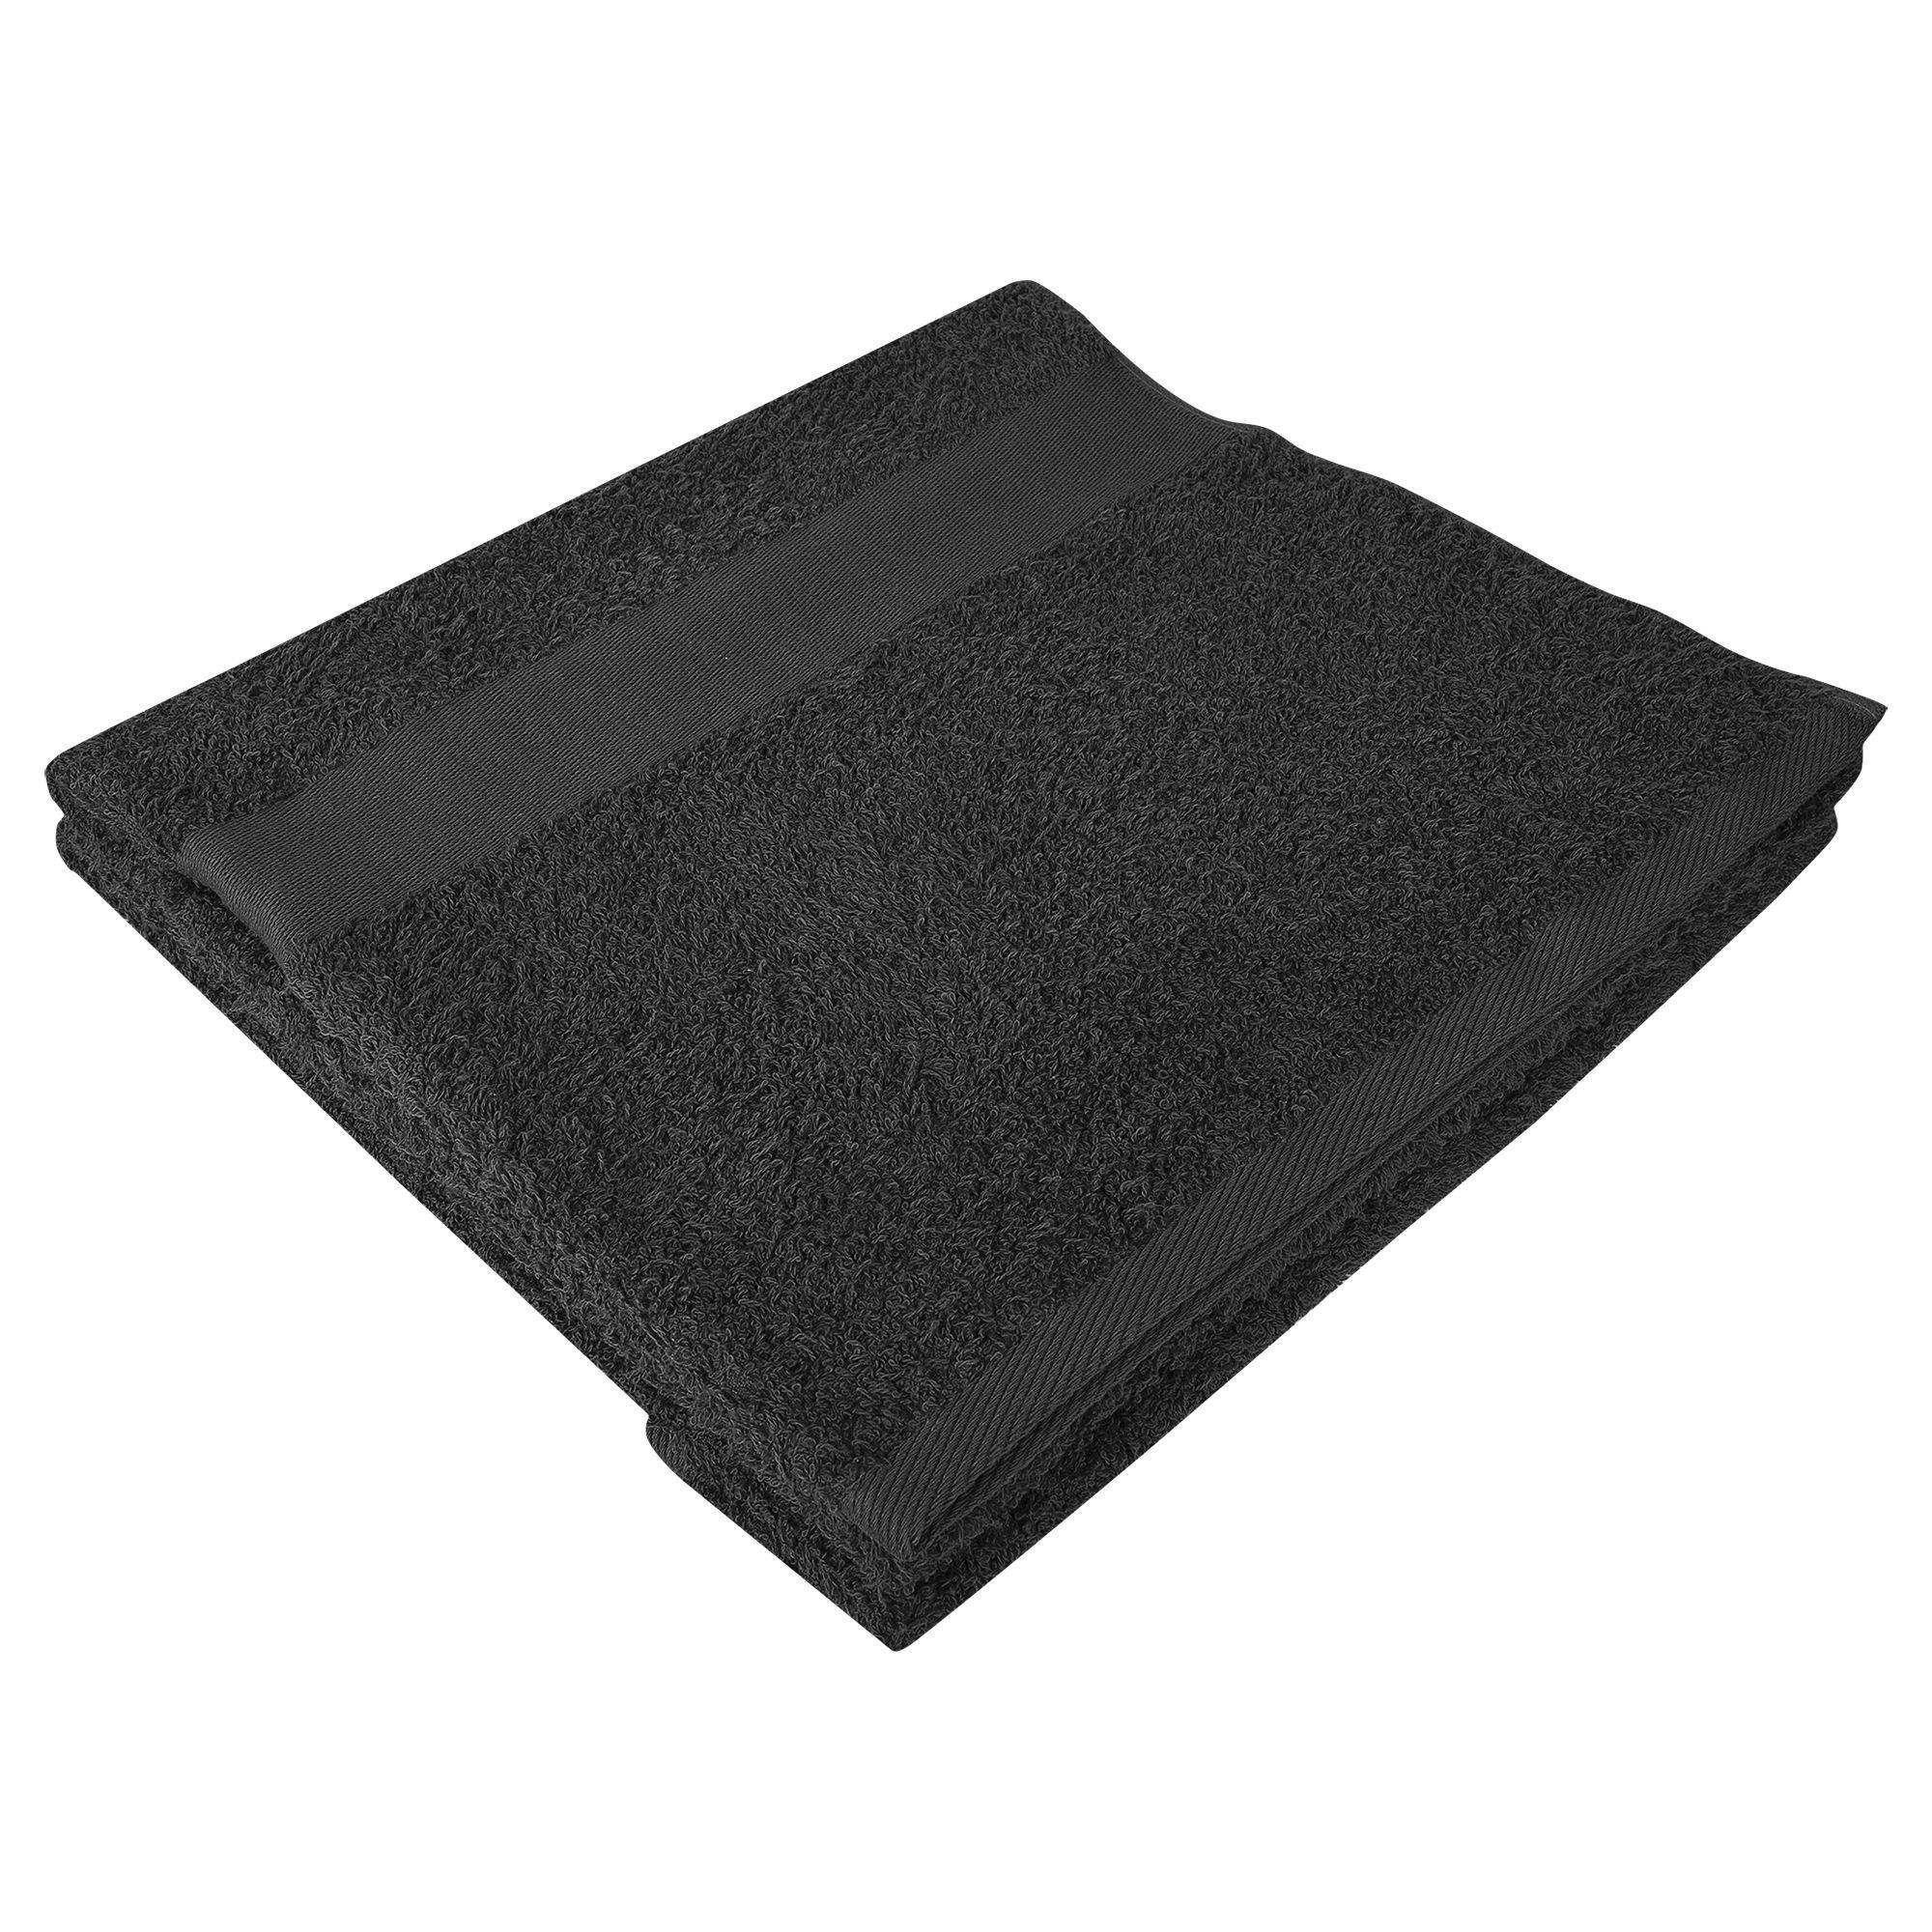 Полотенце махровое Large, черное